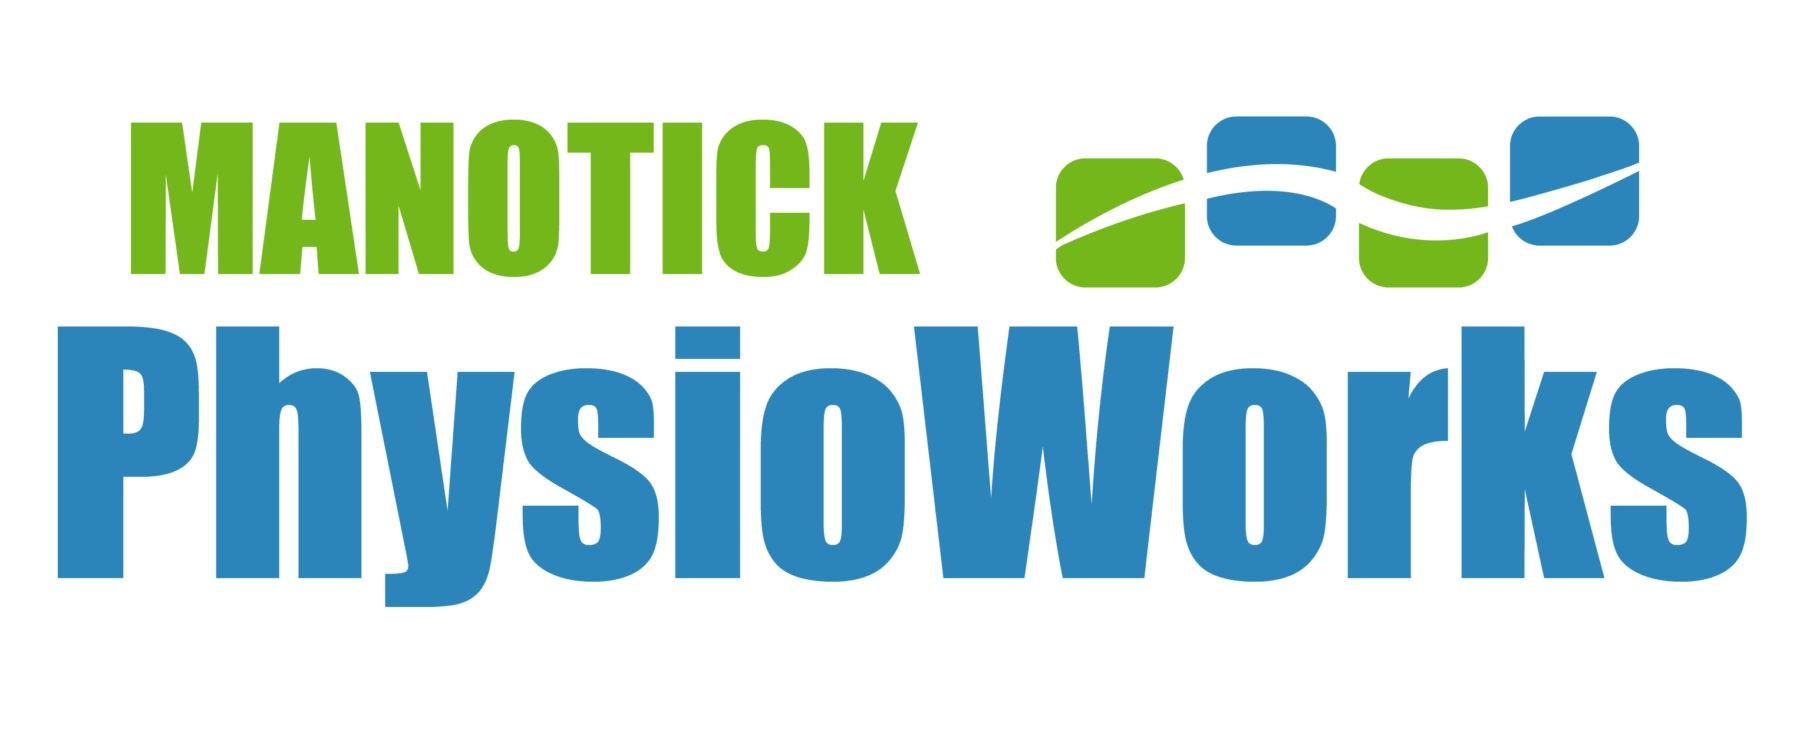 Manotick PhysioWorks logo - Business in Manotick